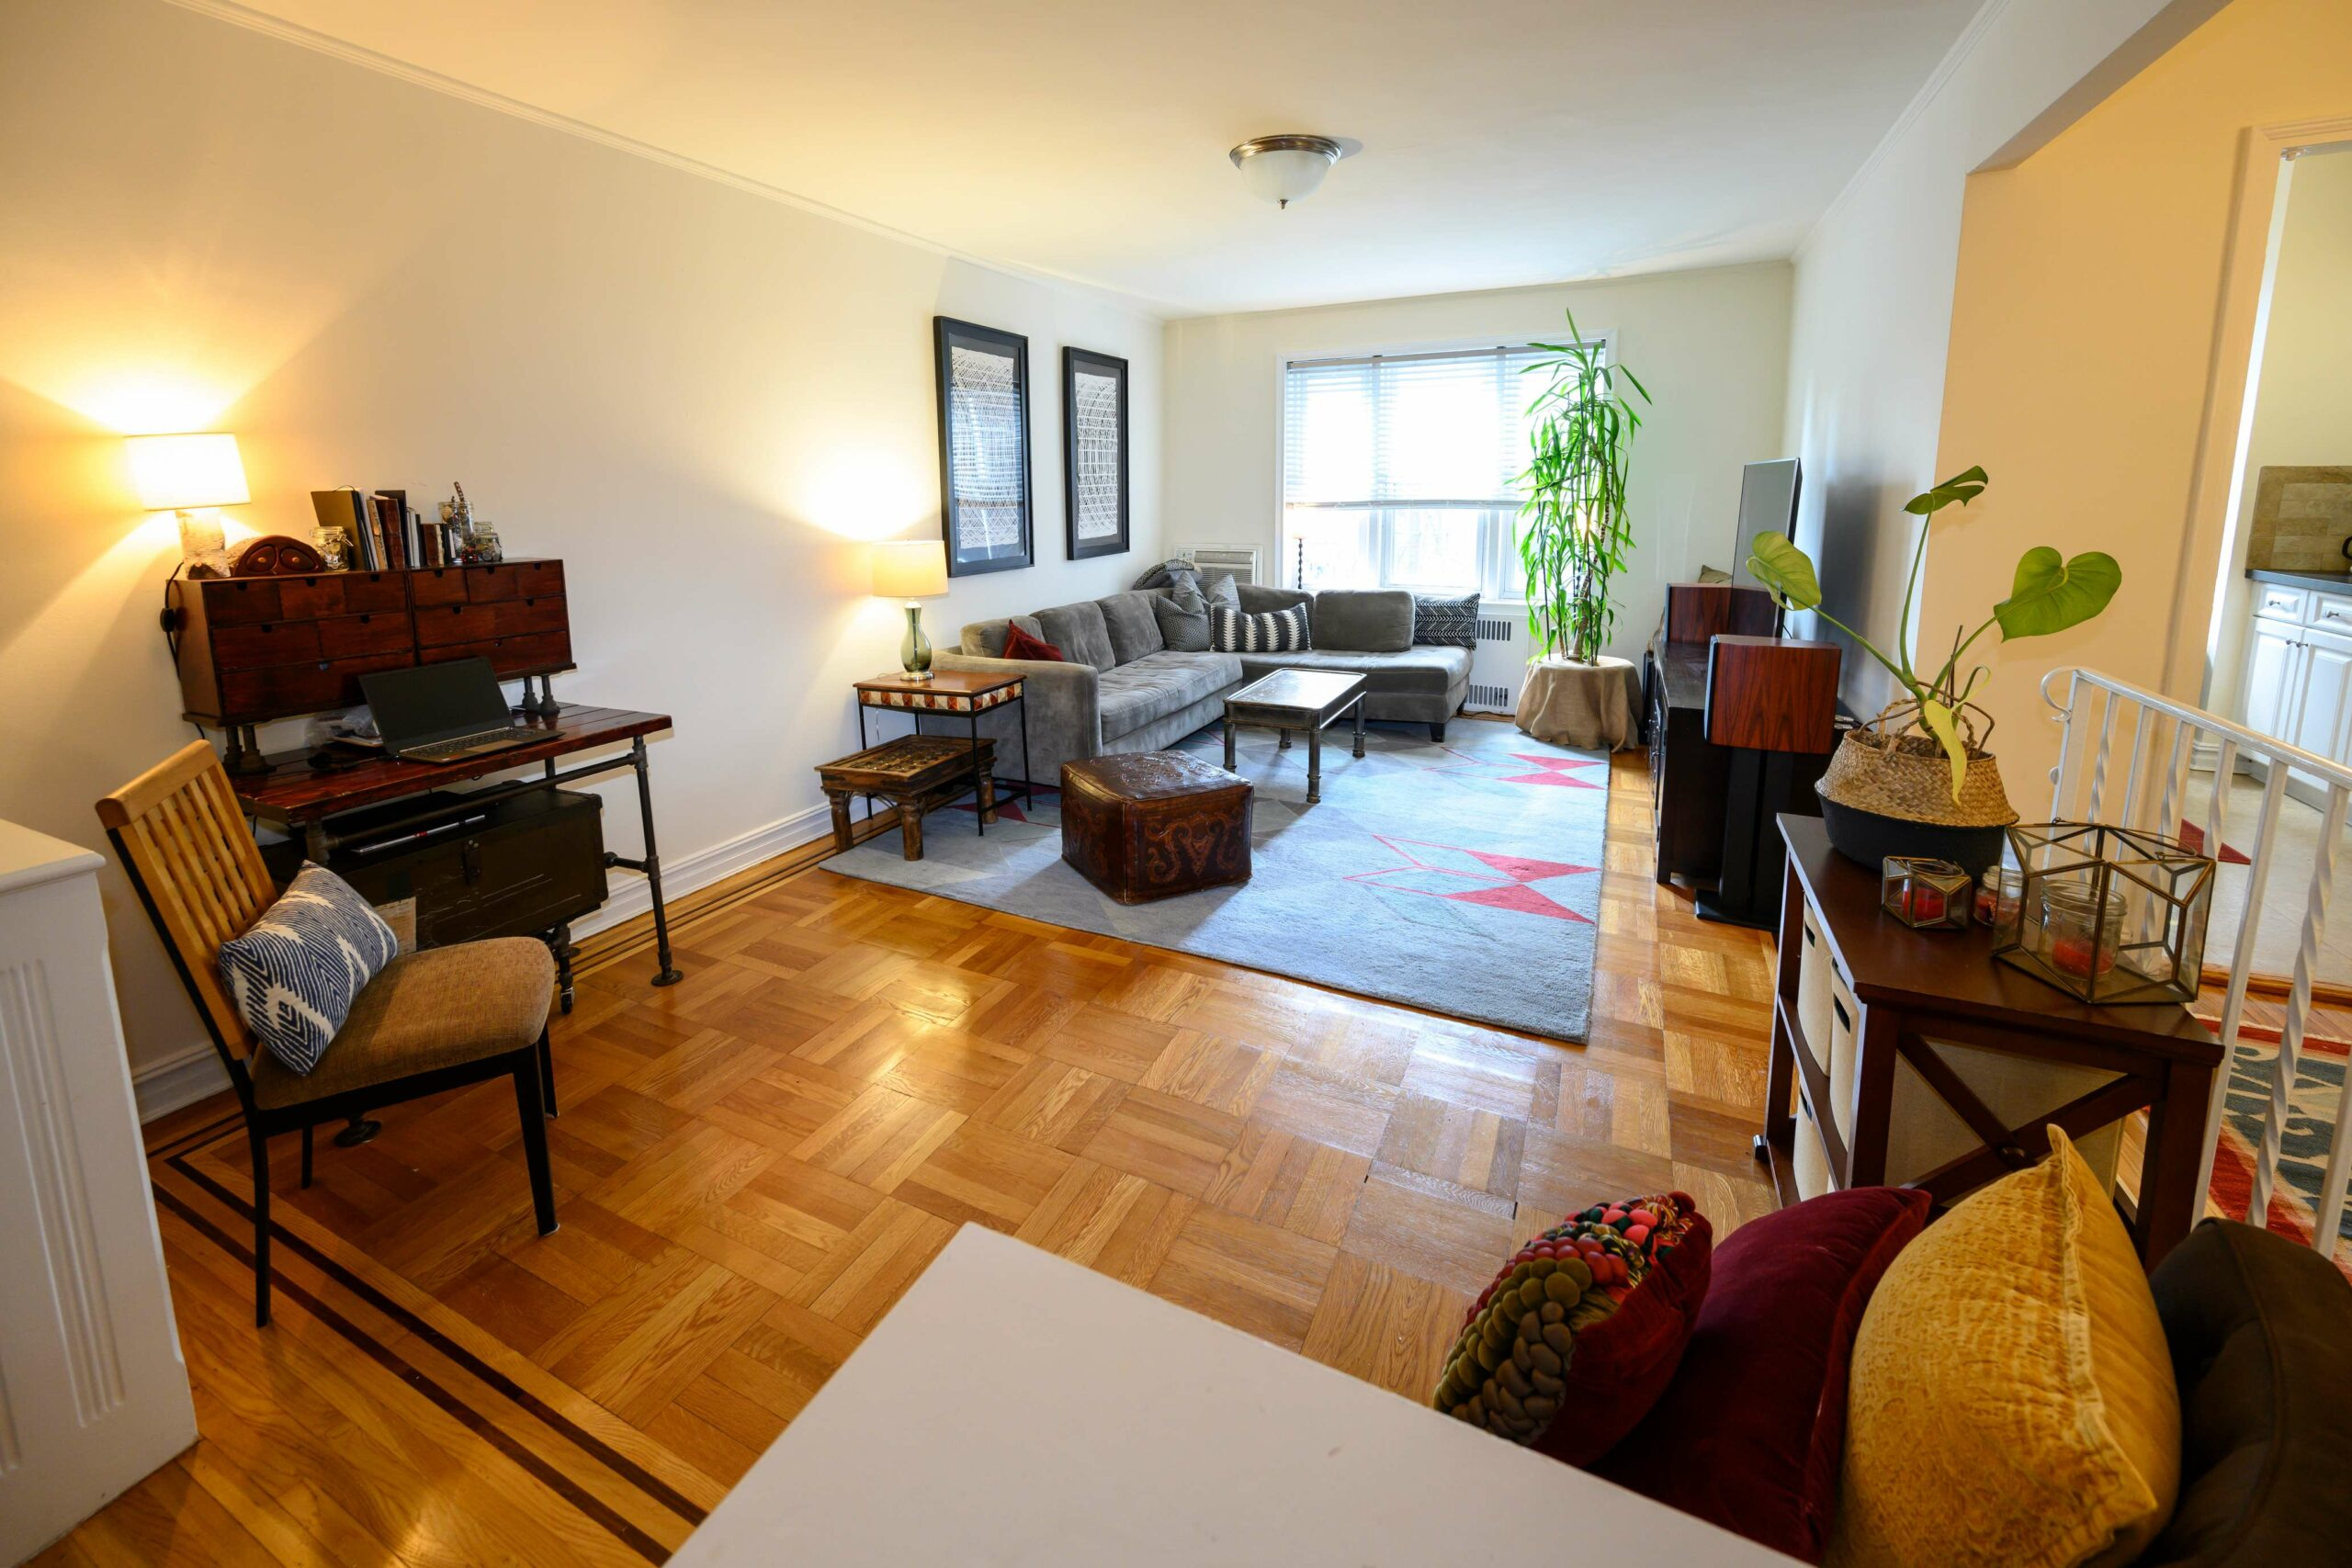 The Midland living room